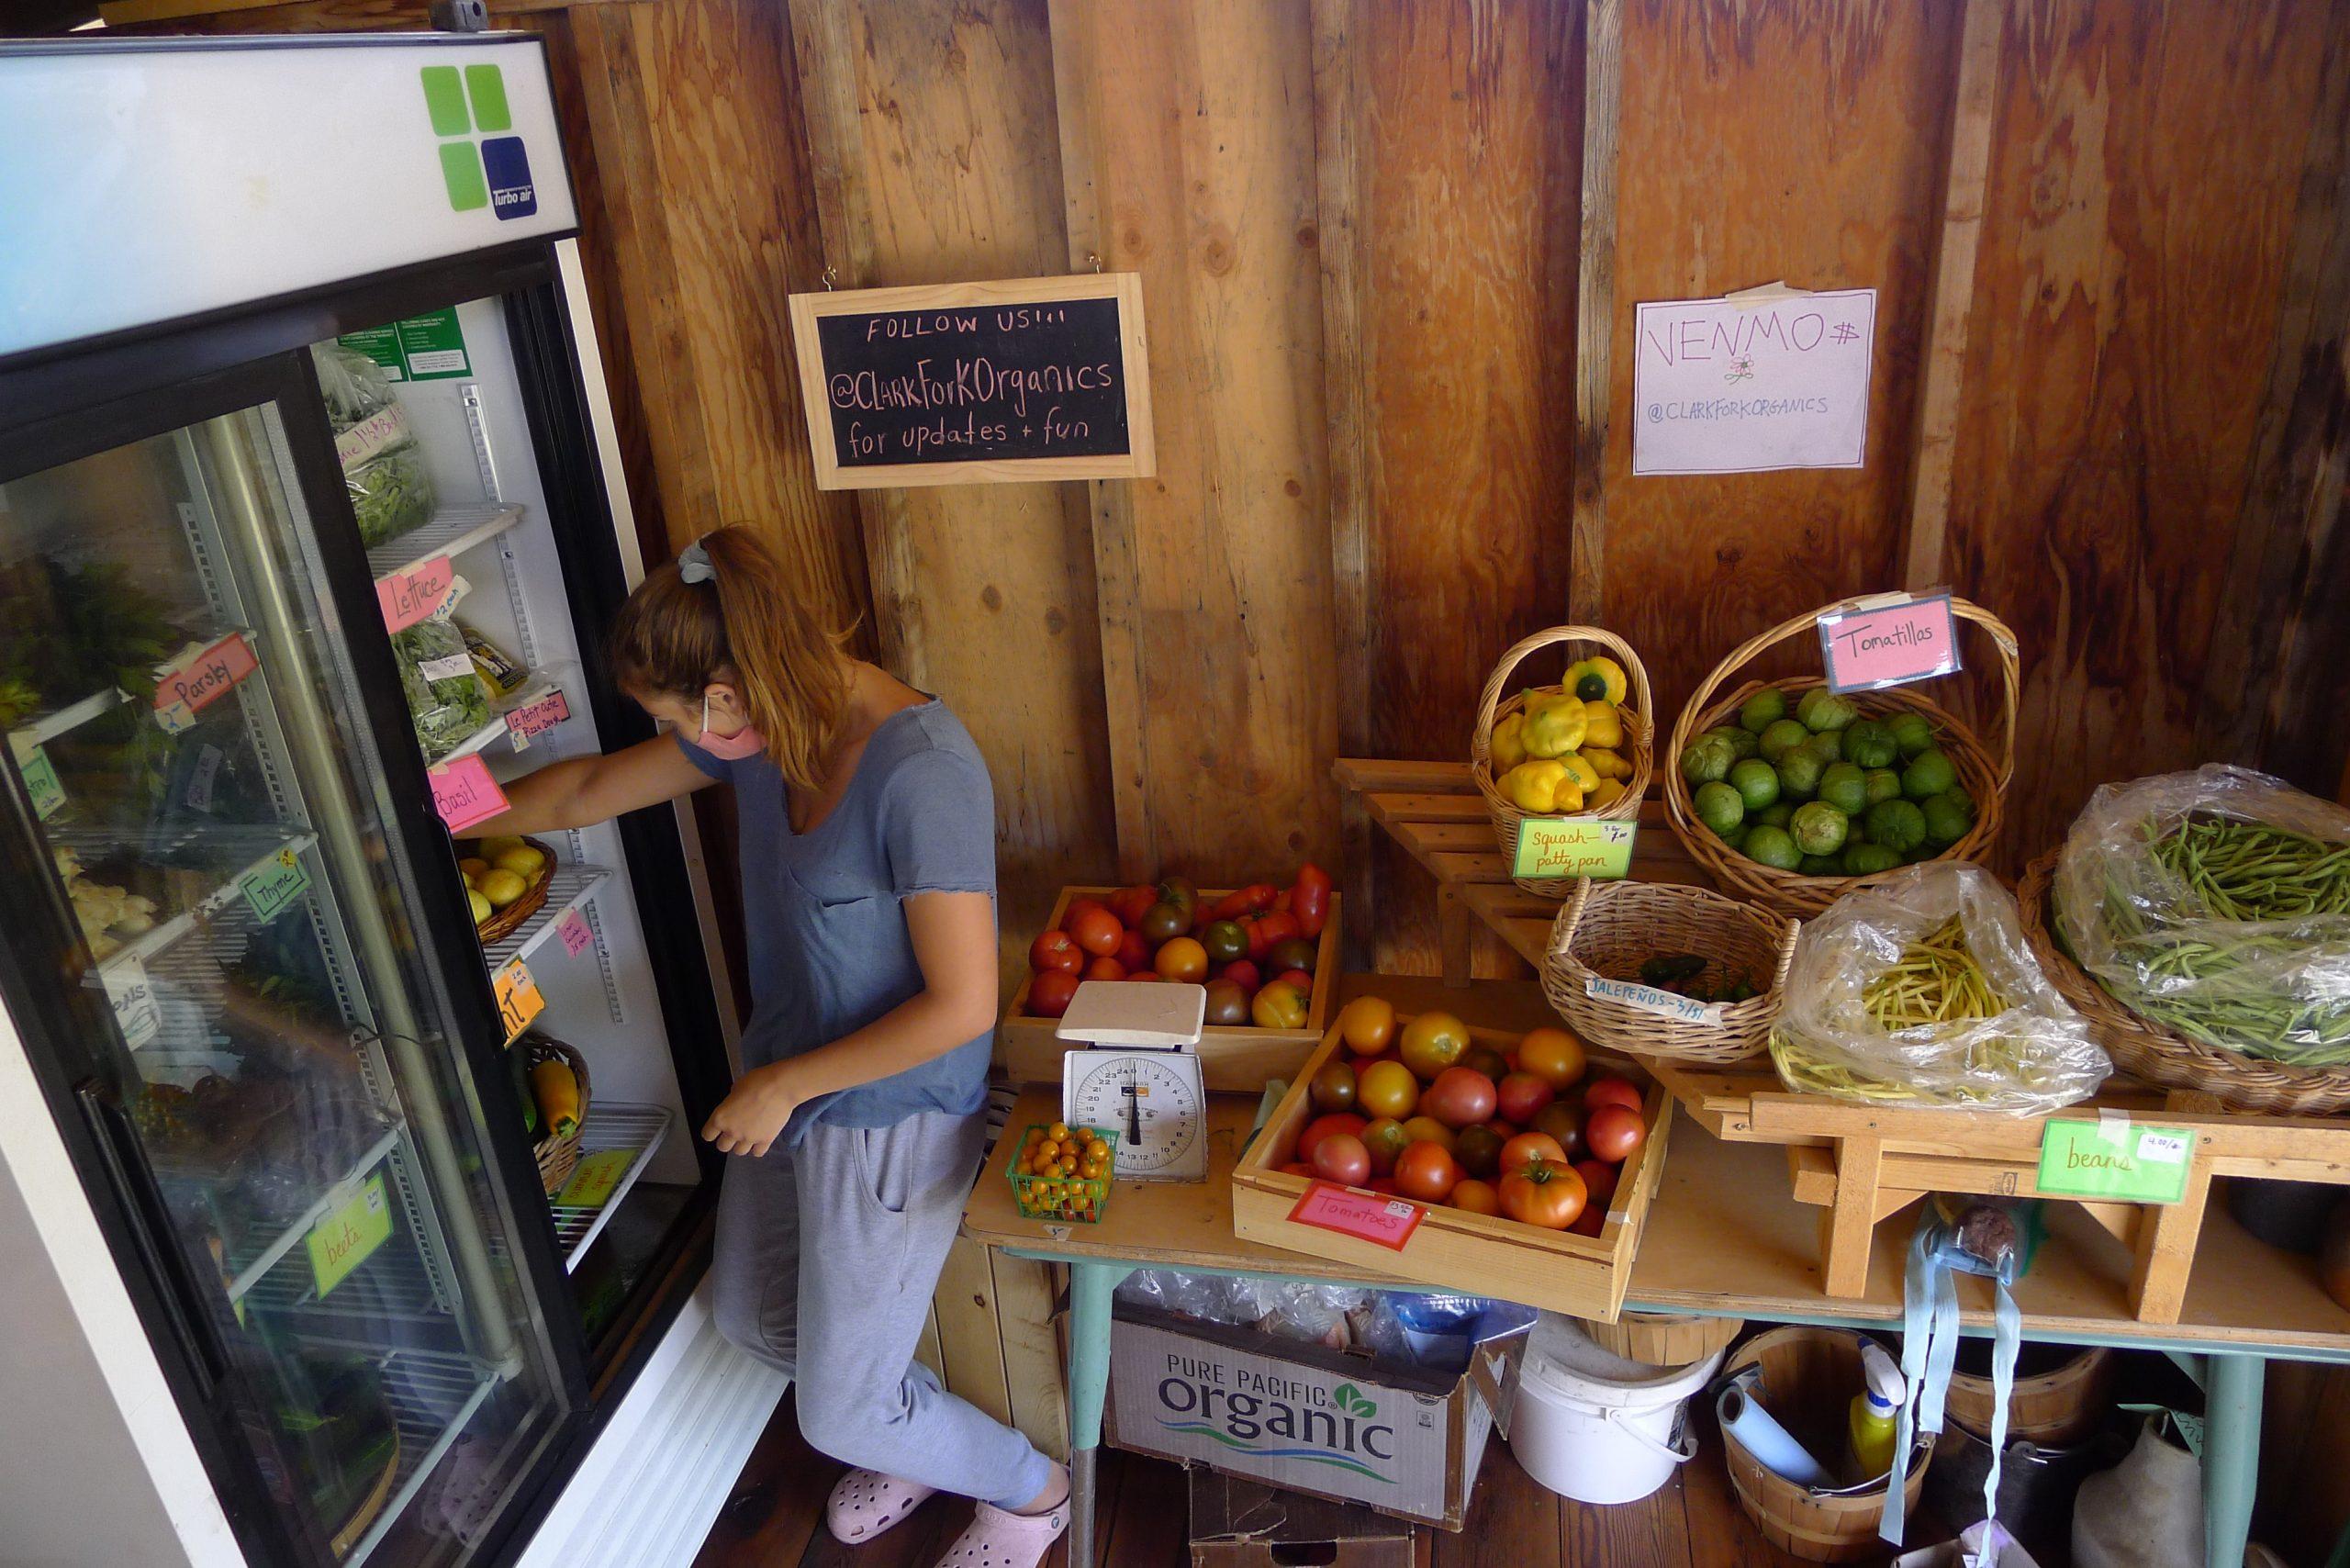 inside clark fork organics farm stand